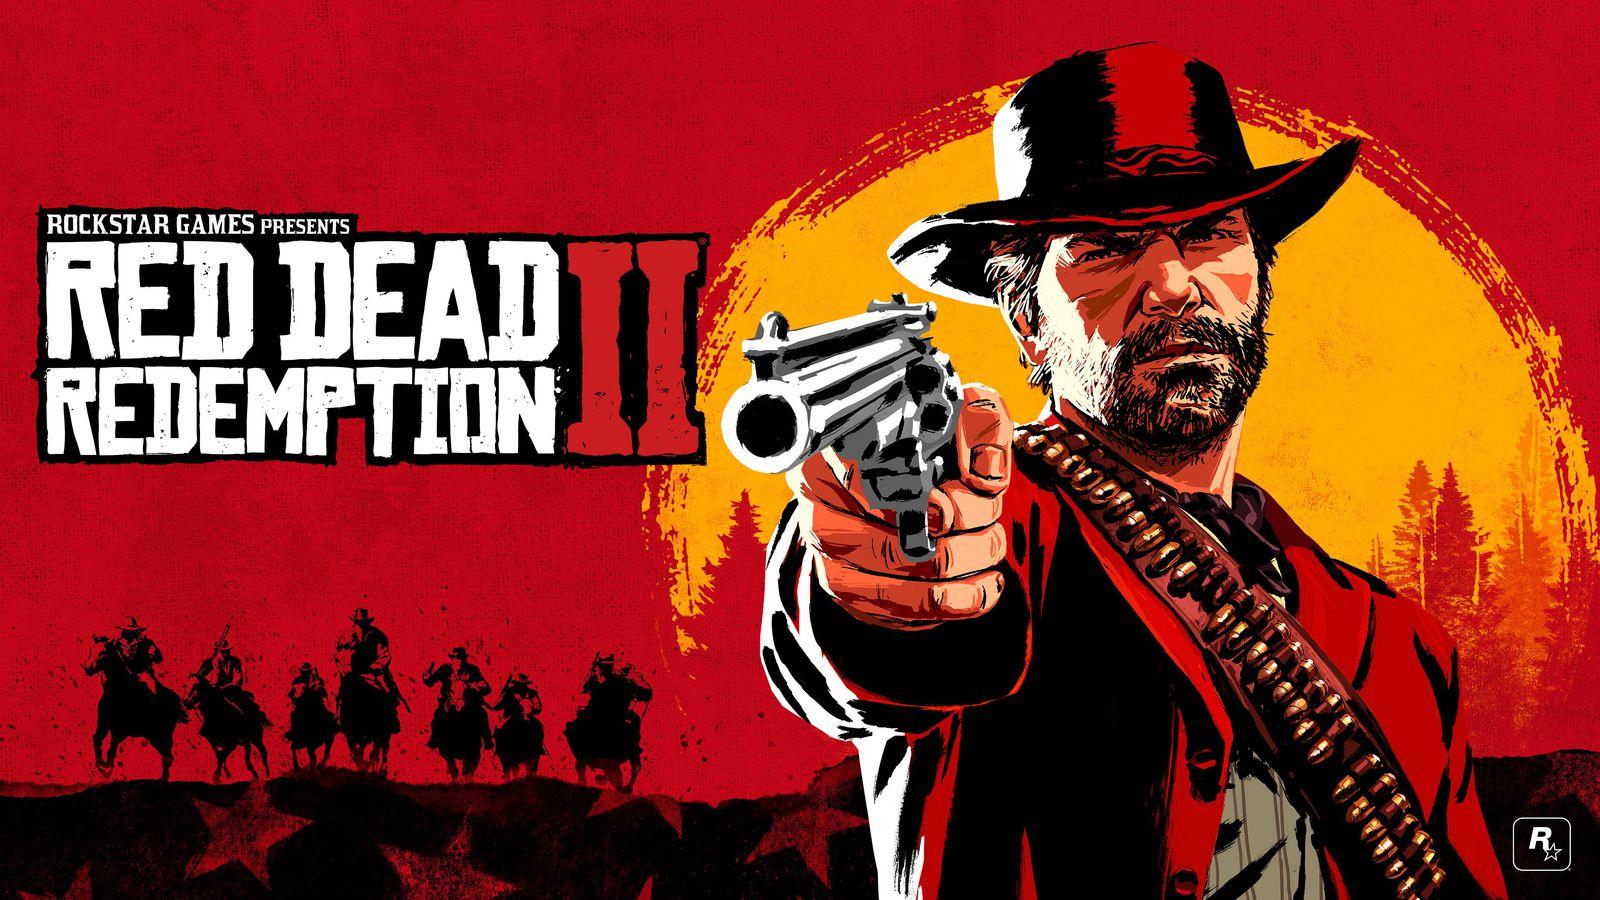 Photo of ۱۲ نکته ی خیلی مهم که قبل از انجام بازی Red Dead Redemption 2 باید انجام داد